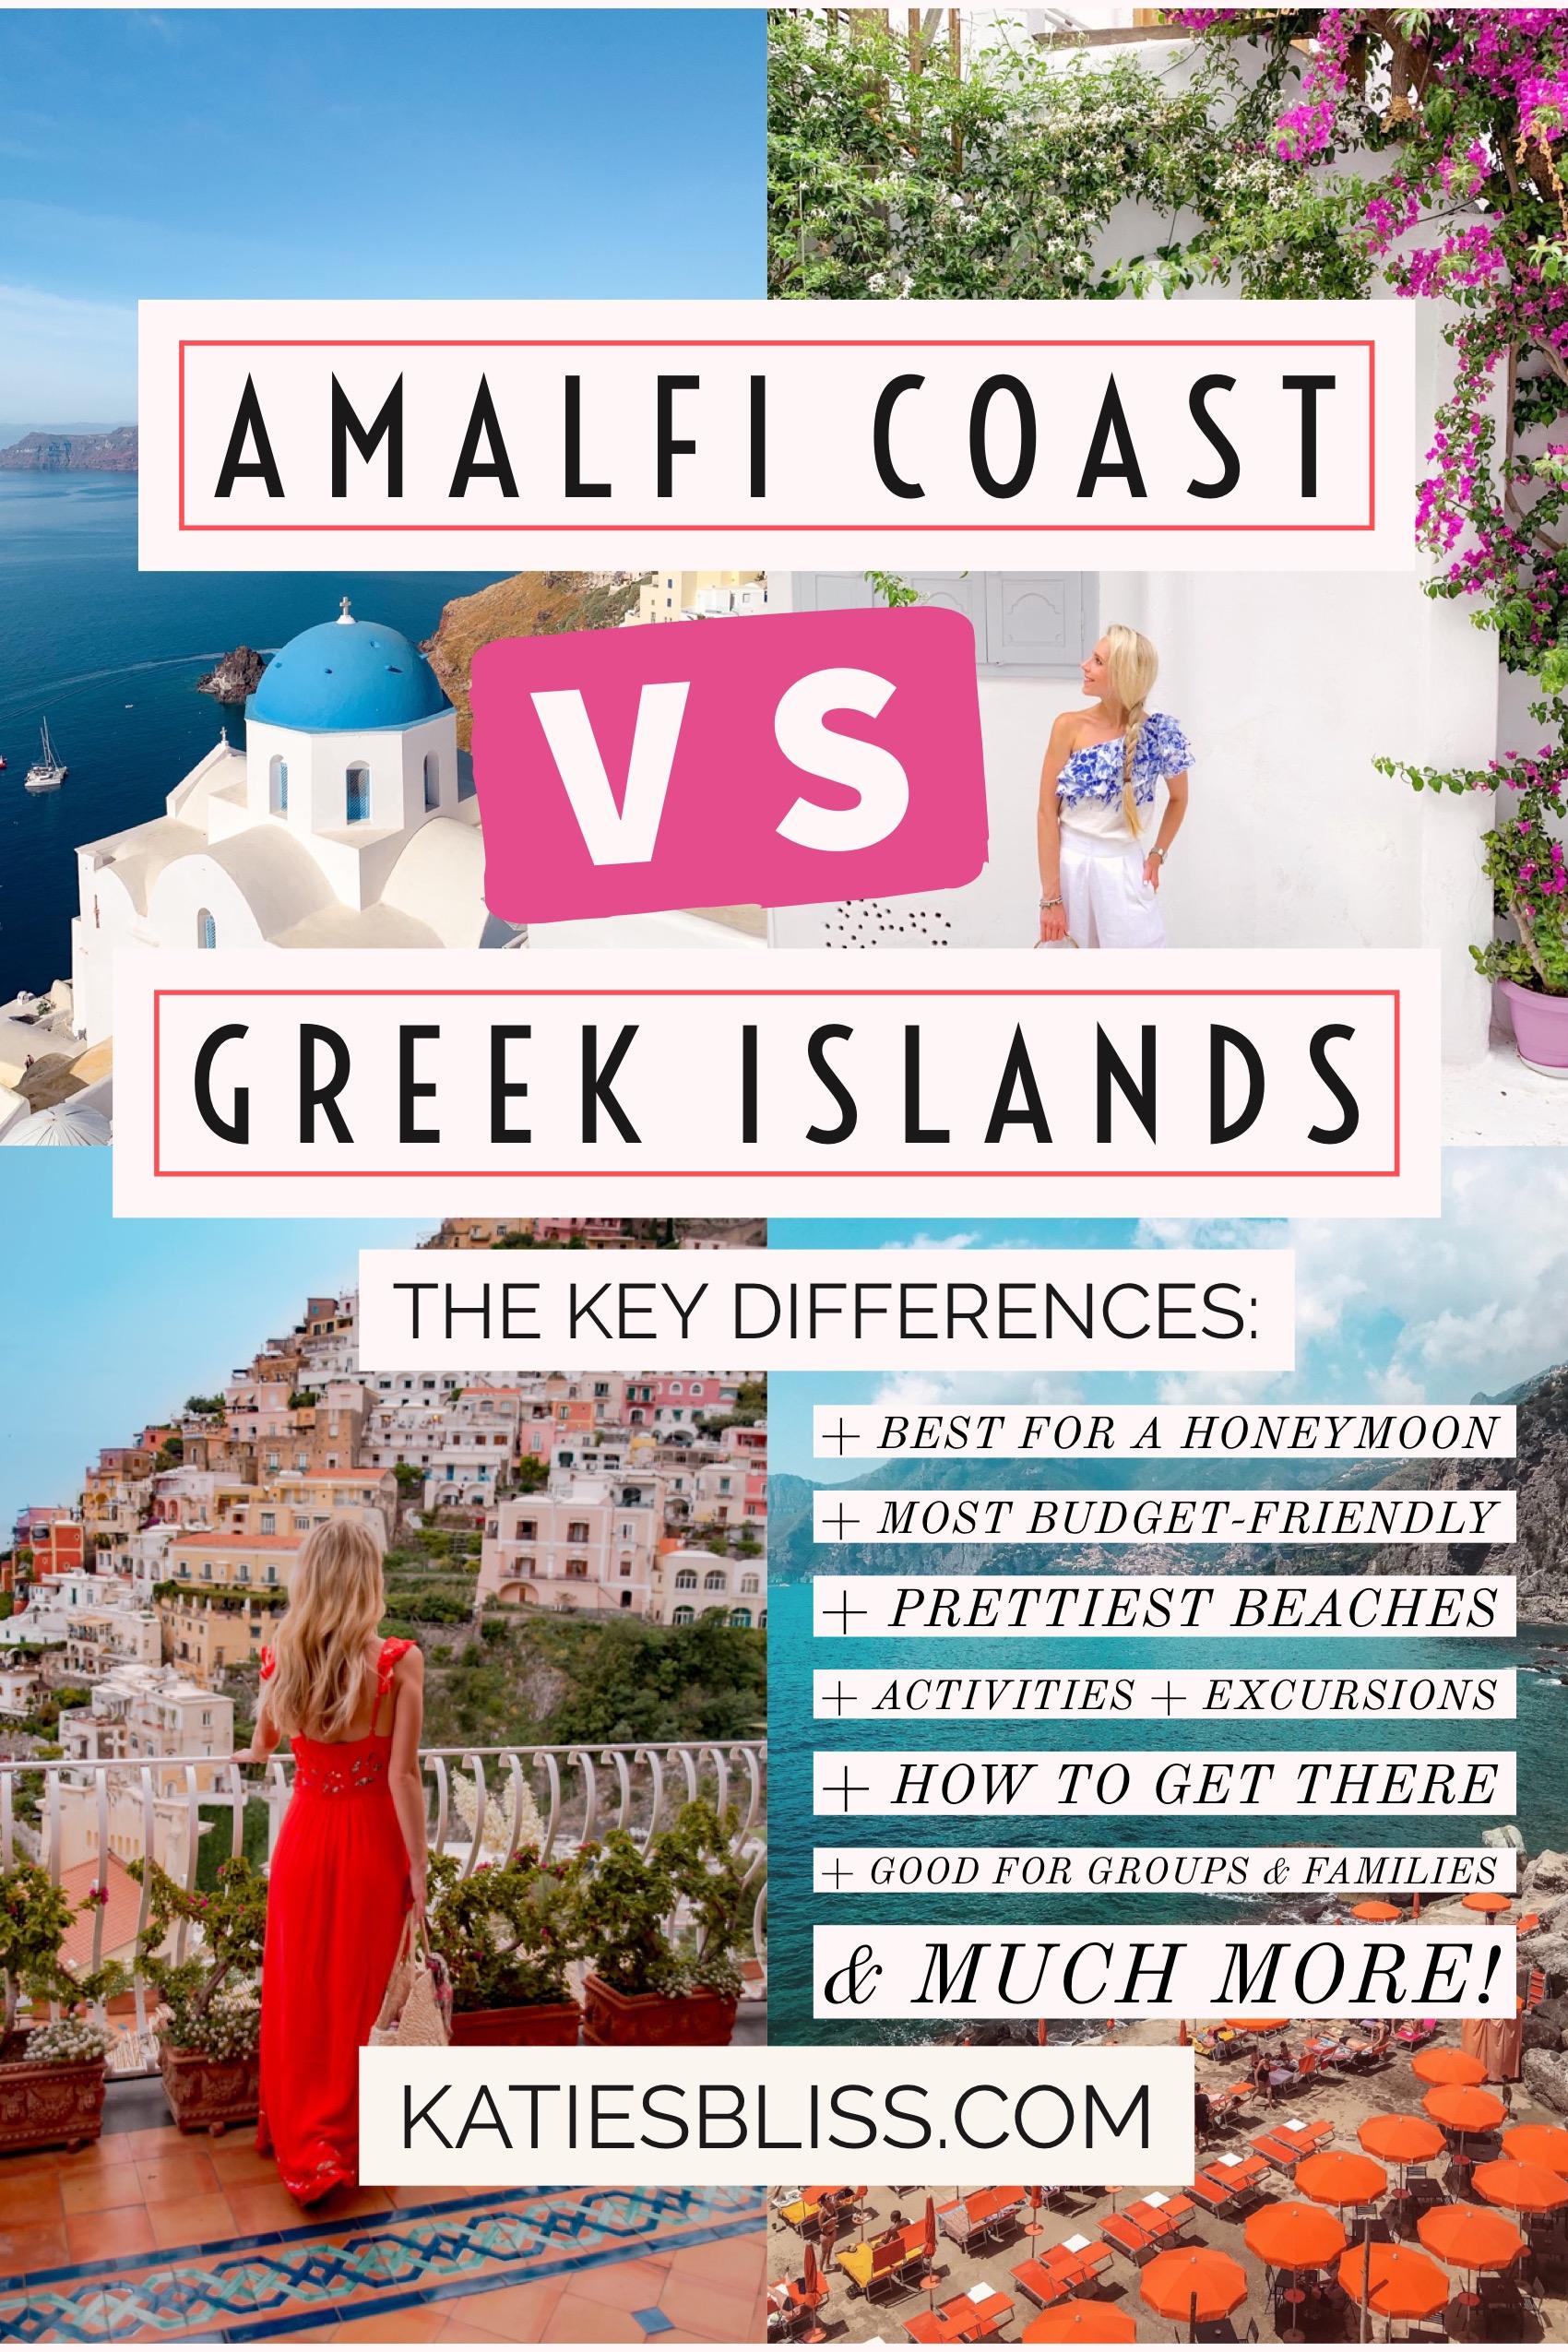 Amalfi Coast vs Santorini Mykonos Greece